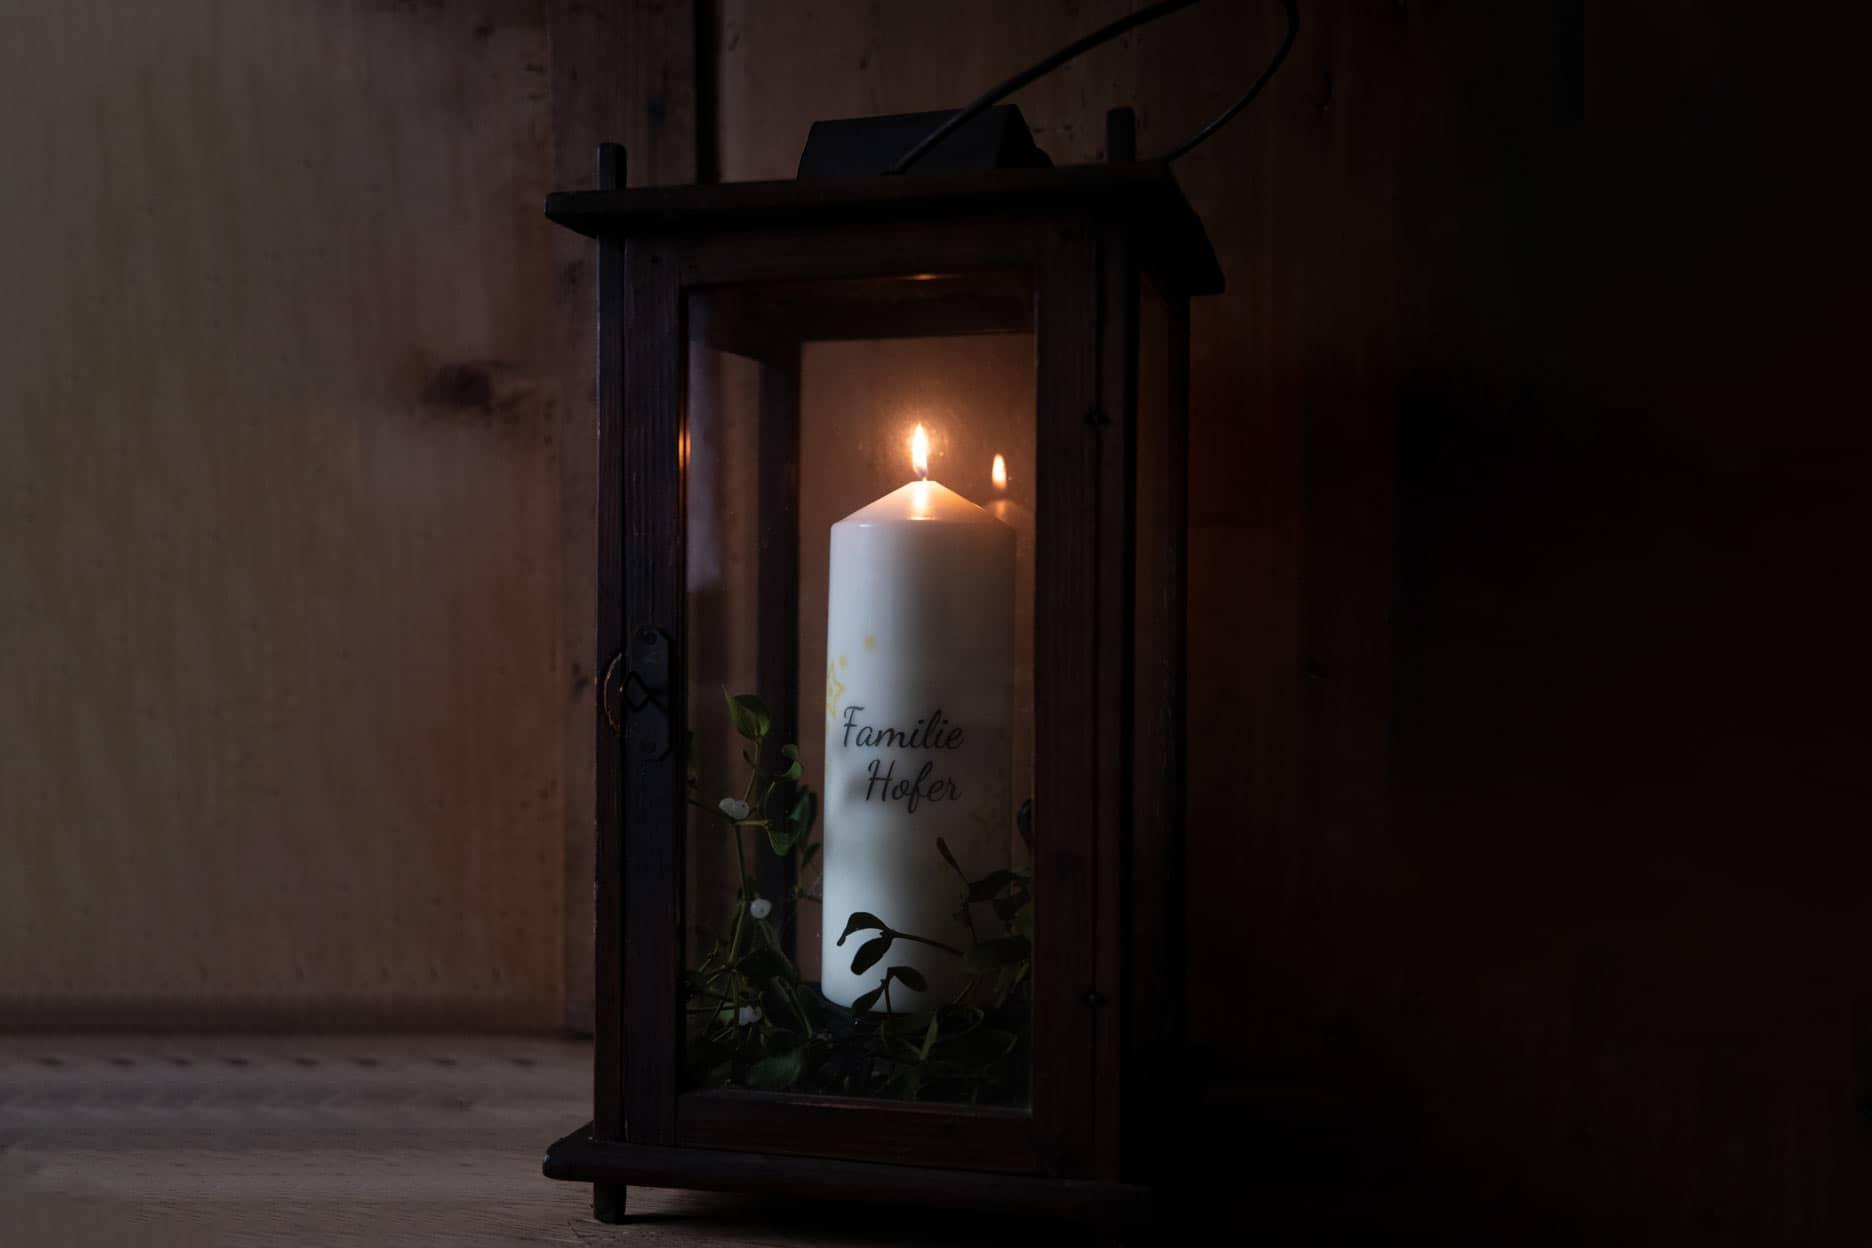 Personalisierte Heilige Nacht Kerze Motiv Familie Hofer